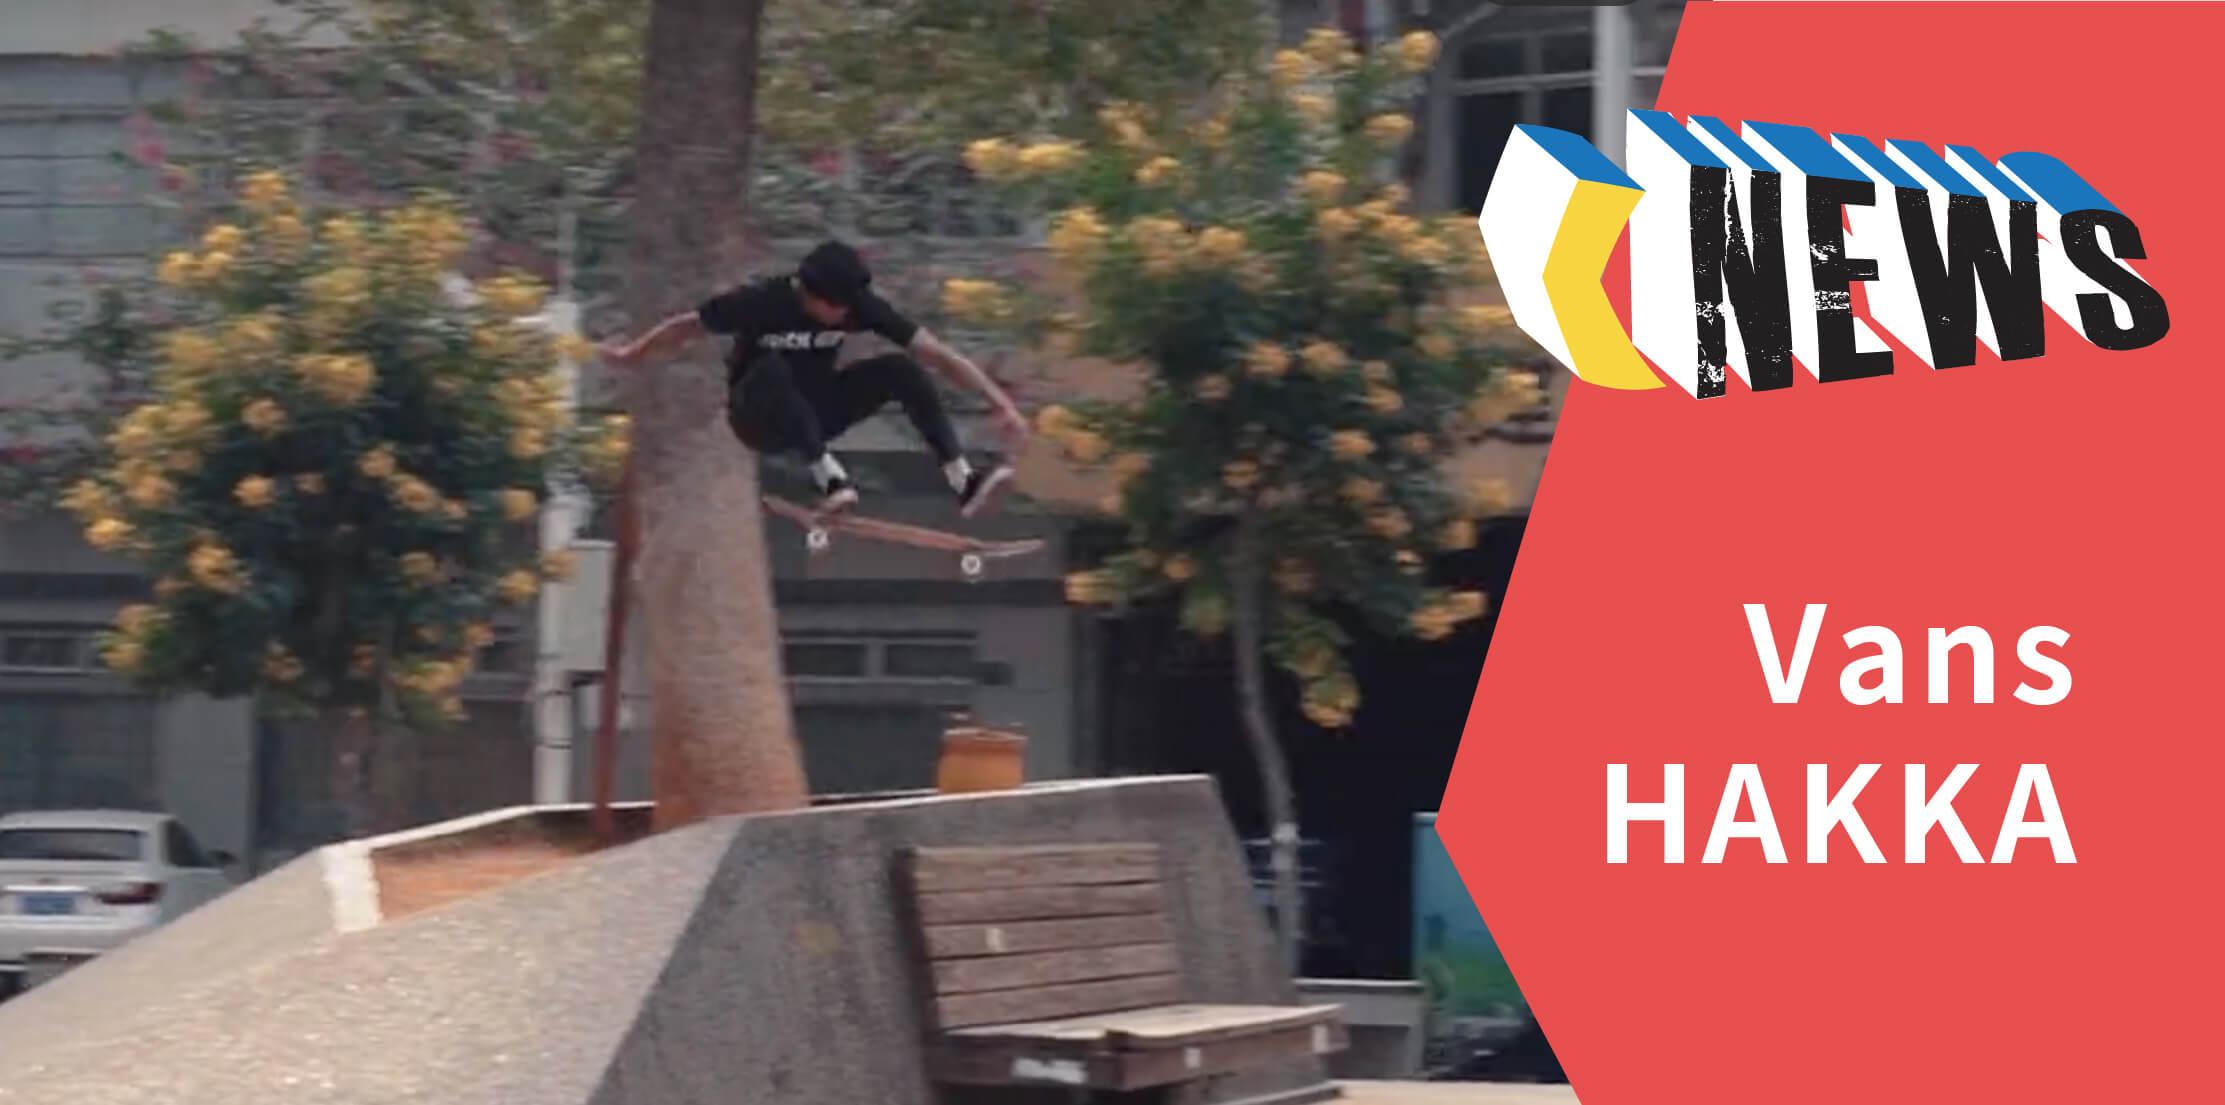 Vans 亚太滑板队厦门巡回短片「HAKKA」正式发布,小黑势如猛虎!